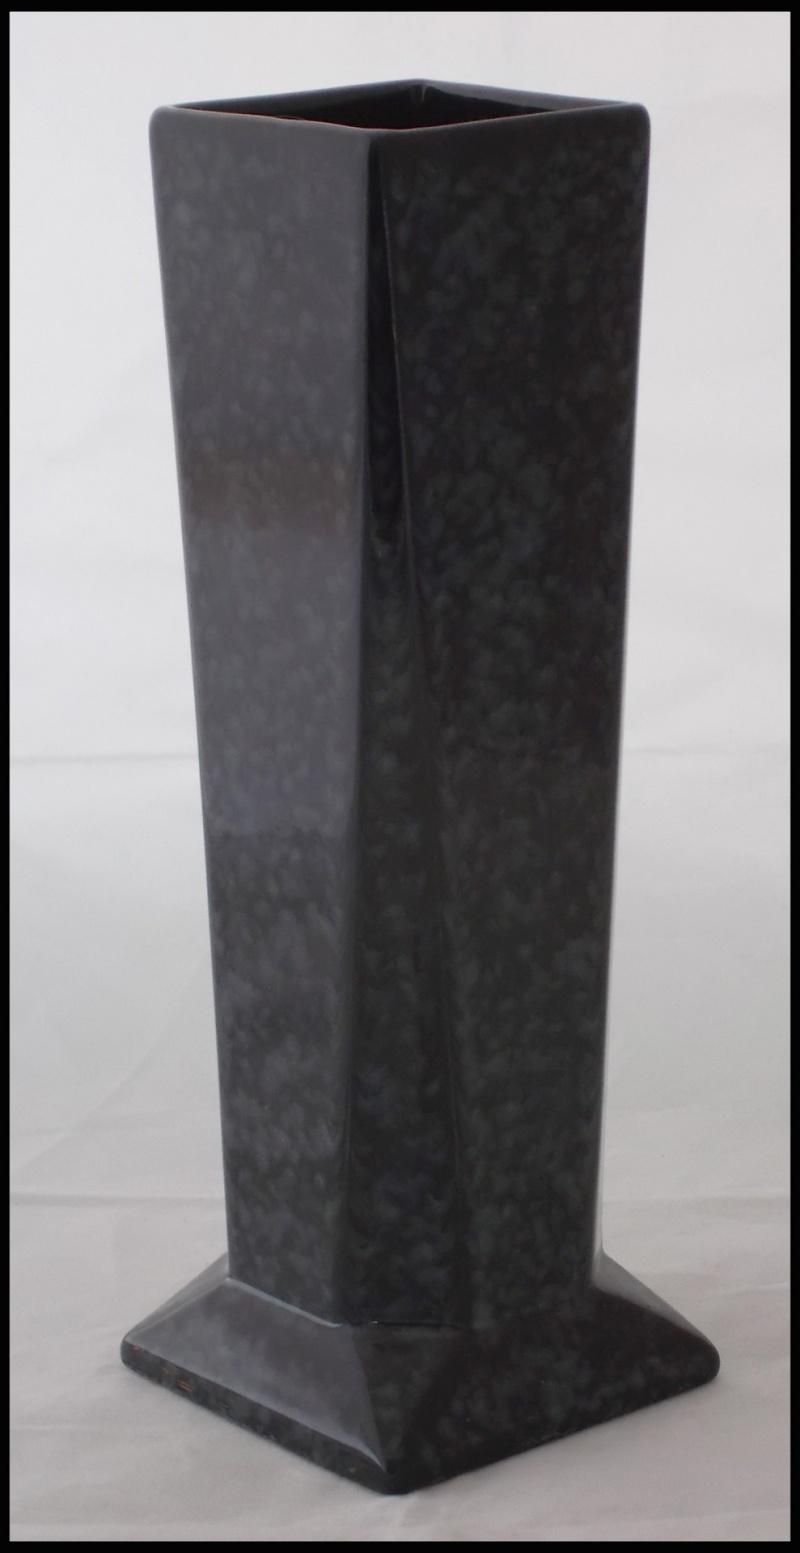 Clayworks black marble glaze vase Dscn8021